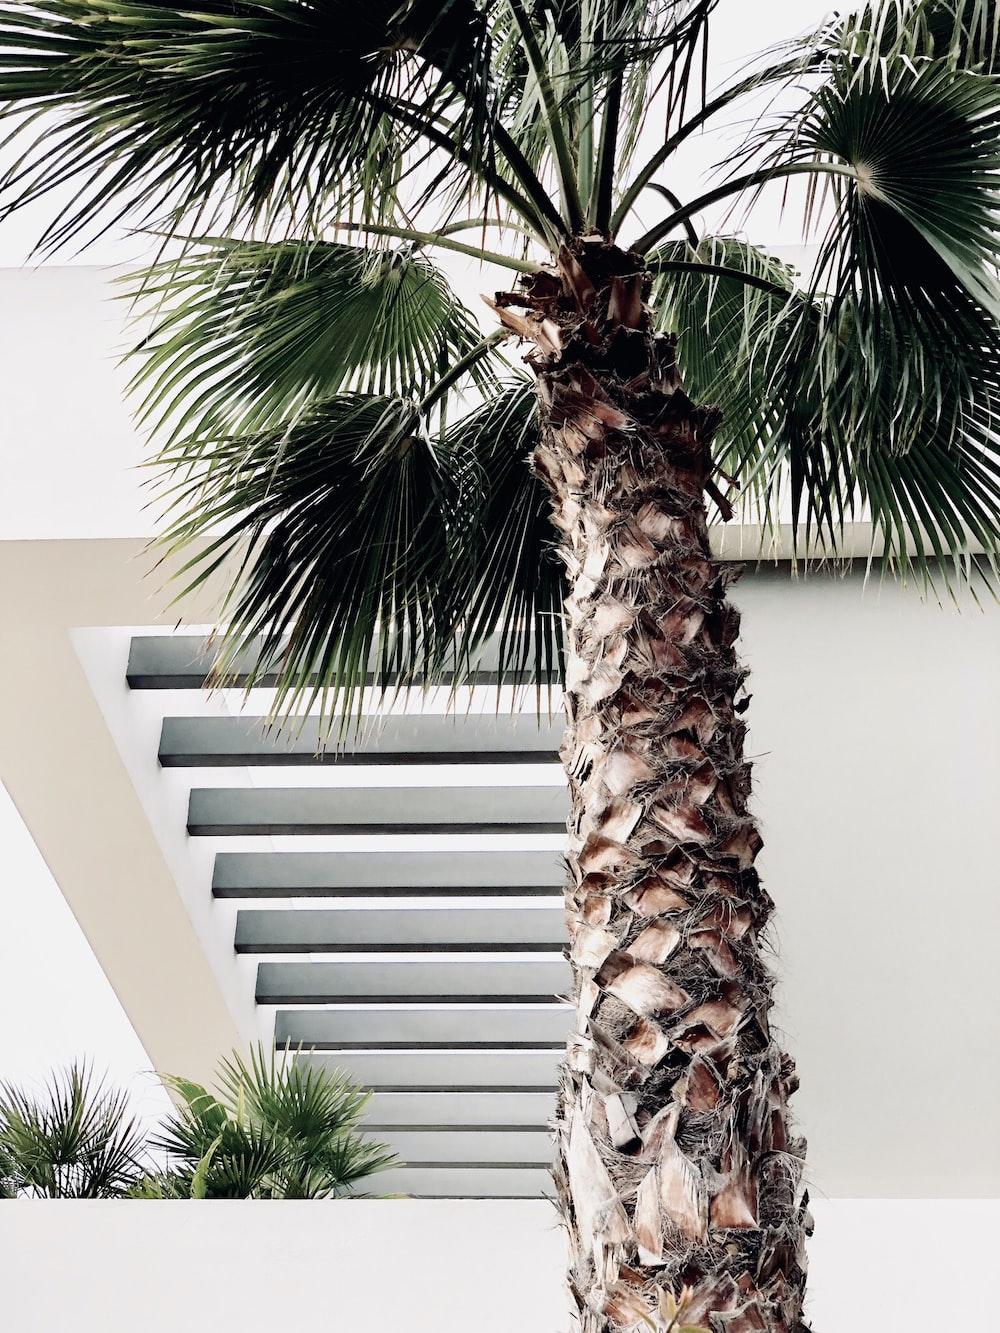 palm tree near white wall